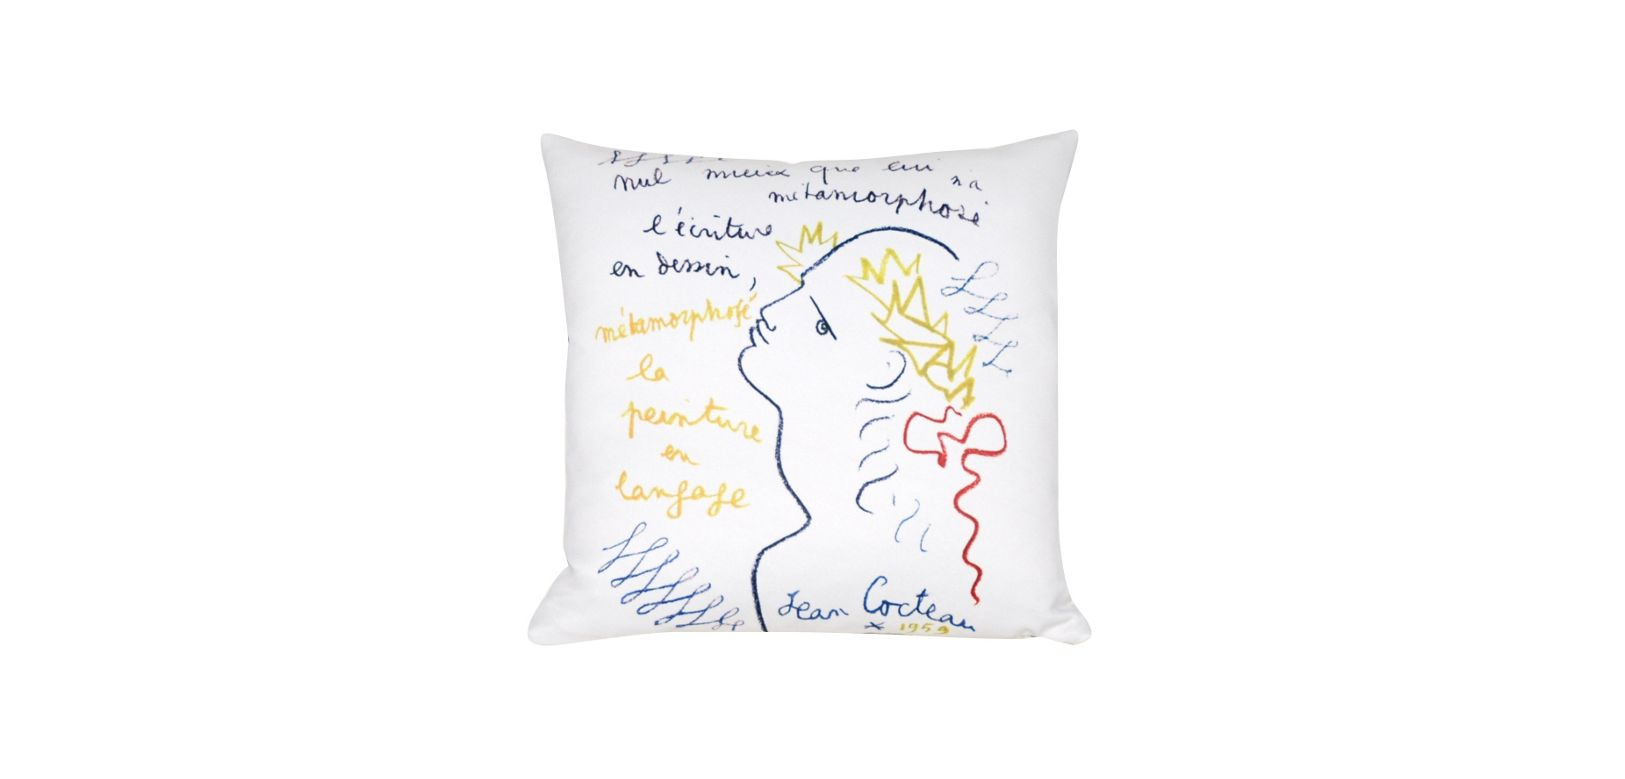 metamorphose jean cocteau cushion roche bobois. Black Bedroom Furniture Sets. Home Design Ideas